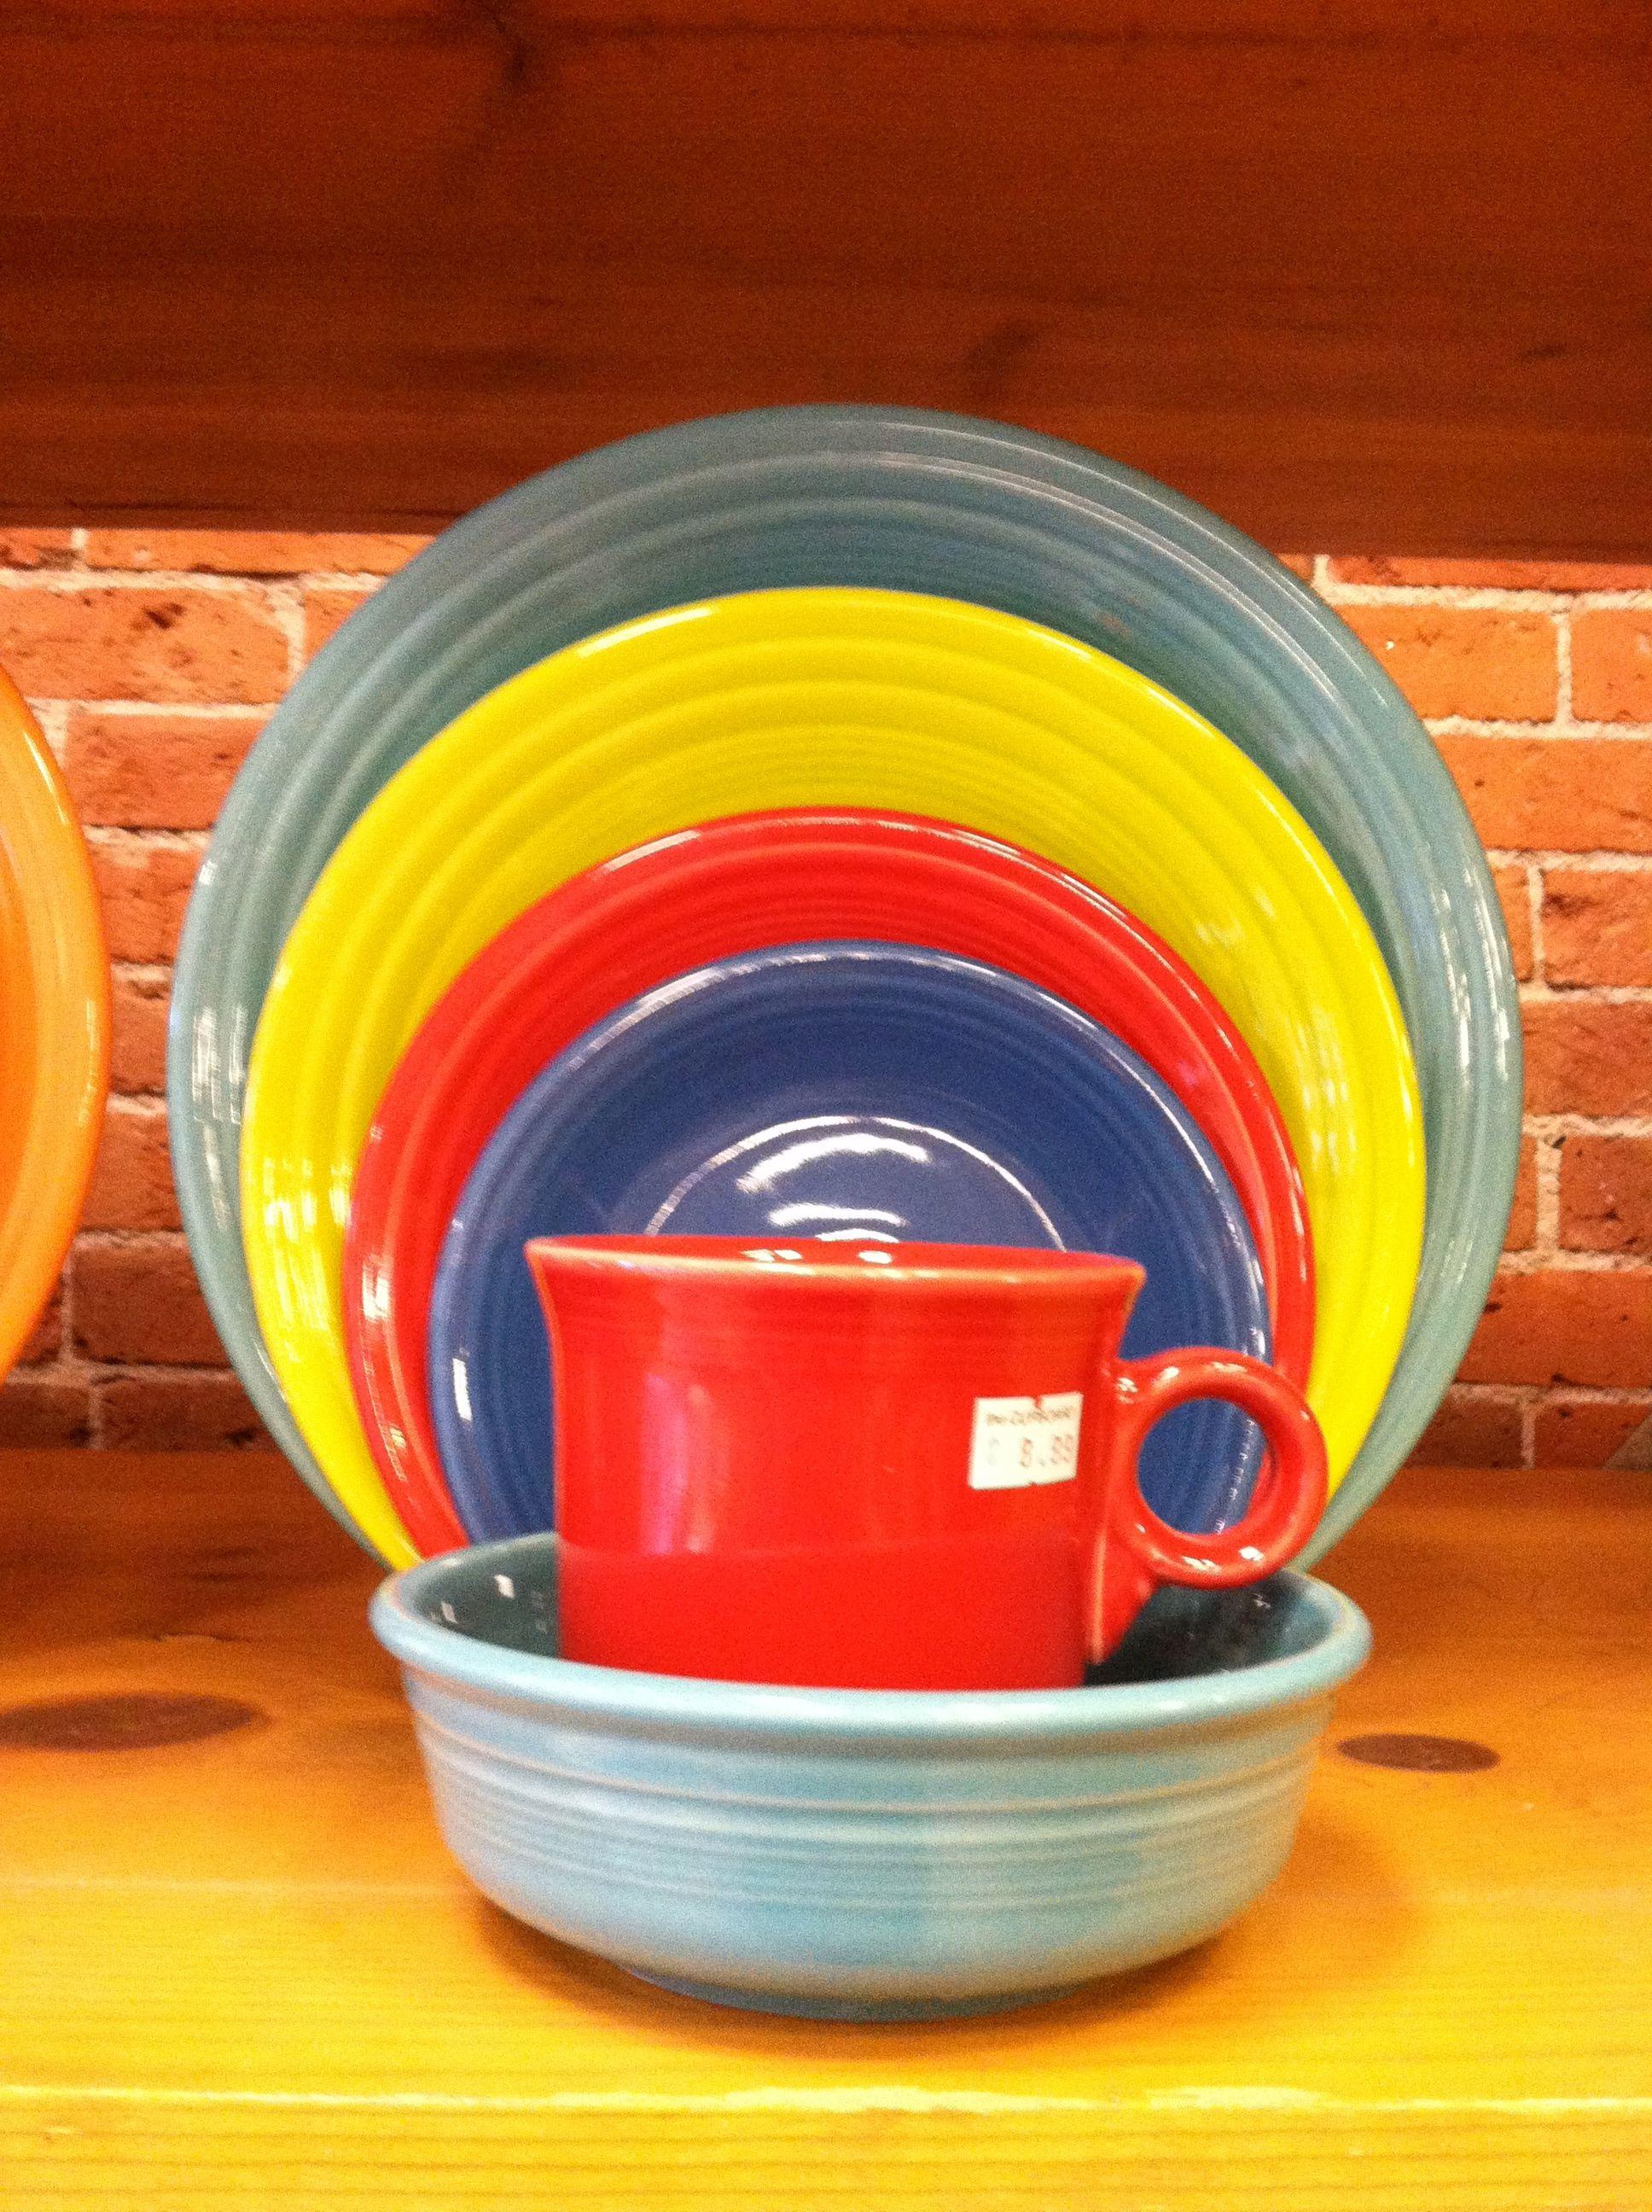 Fiestaware Turquoise, Lemongrass, Scarlet, Lapis Its A Fiestaware Fiesta #